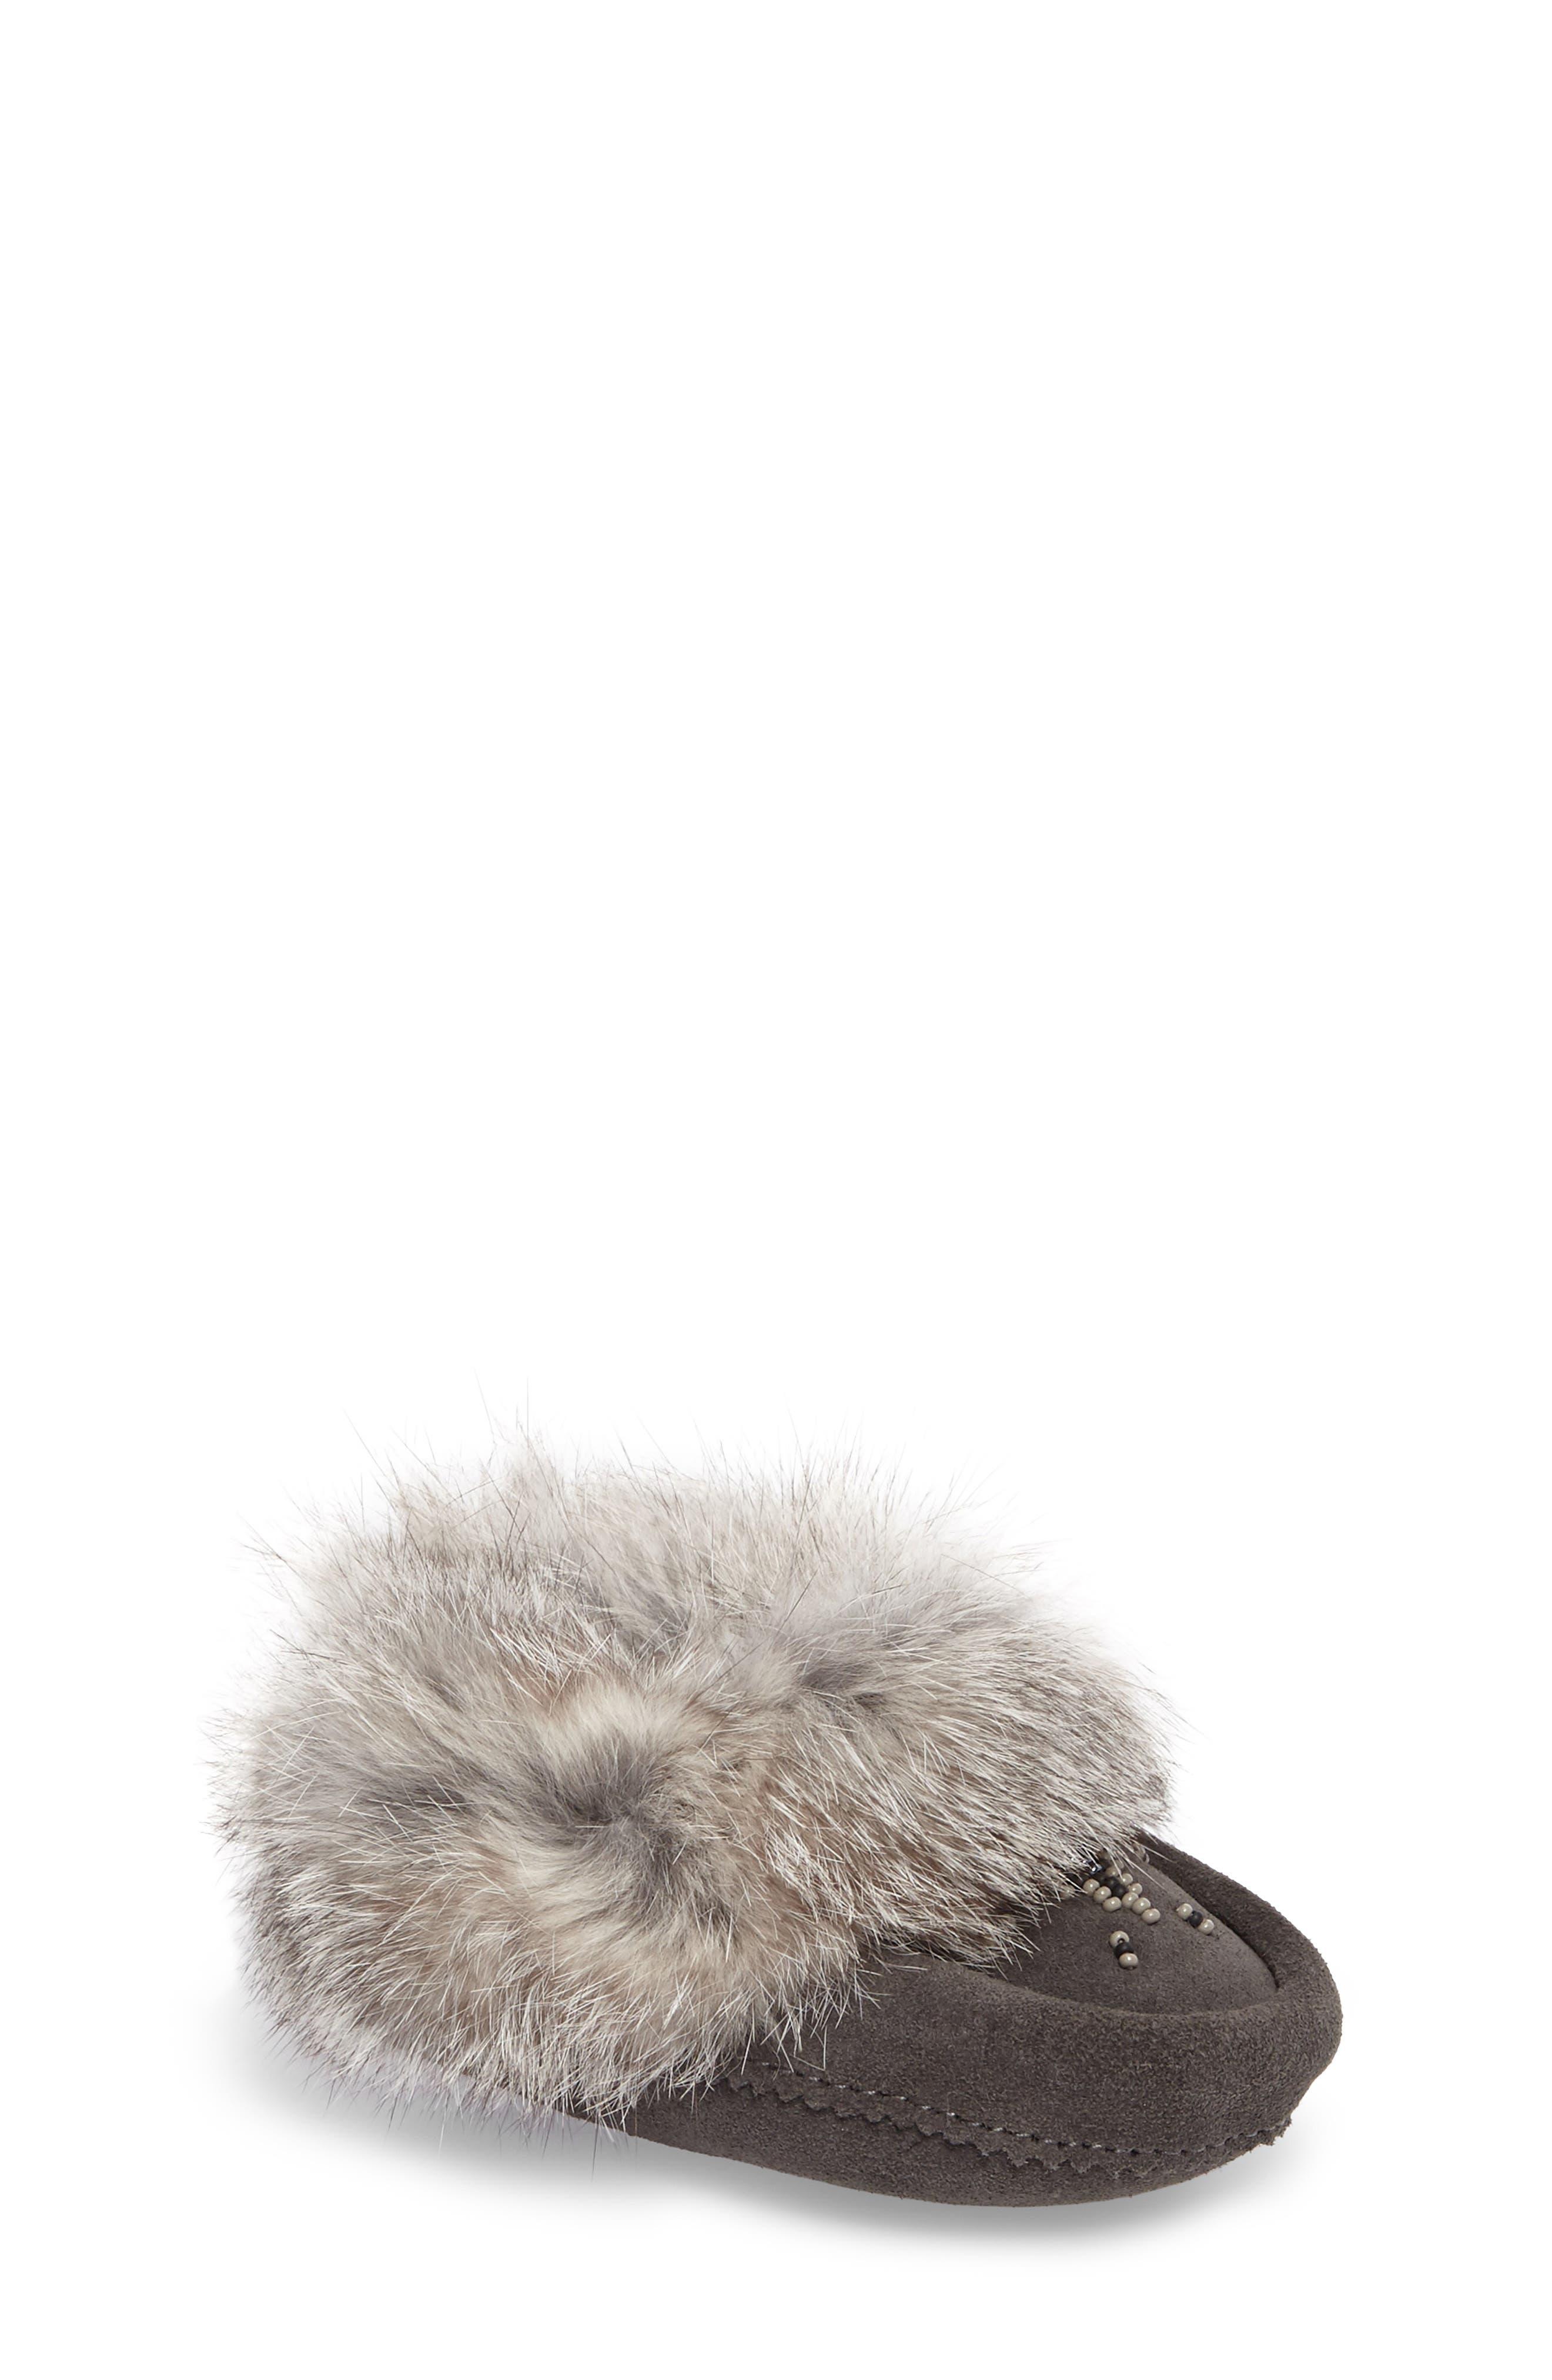 Genuine Rabbit Fur Moccasin,                             Main thumbnail 1, color,                             Charcoal